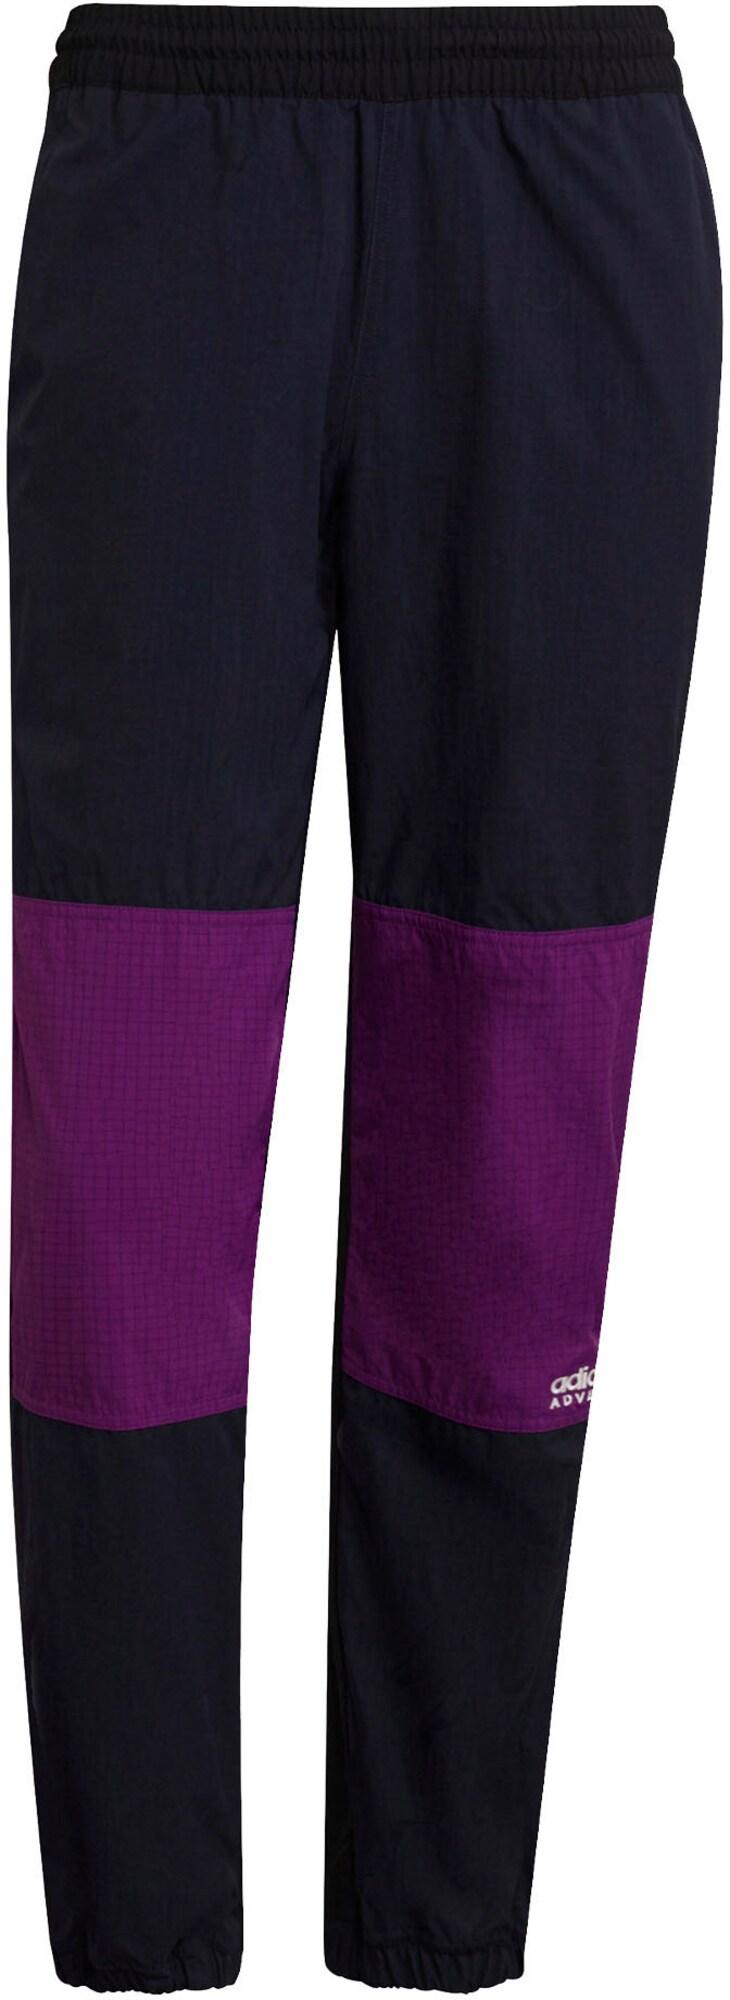 ADIDAS ORIGINALS Kalhoty 'Adventure'  marine modrá / fialová